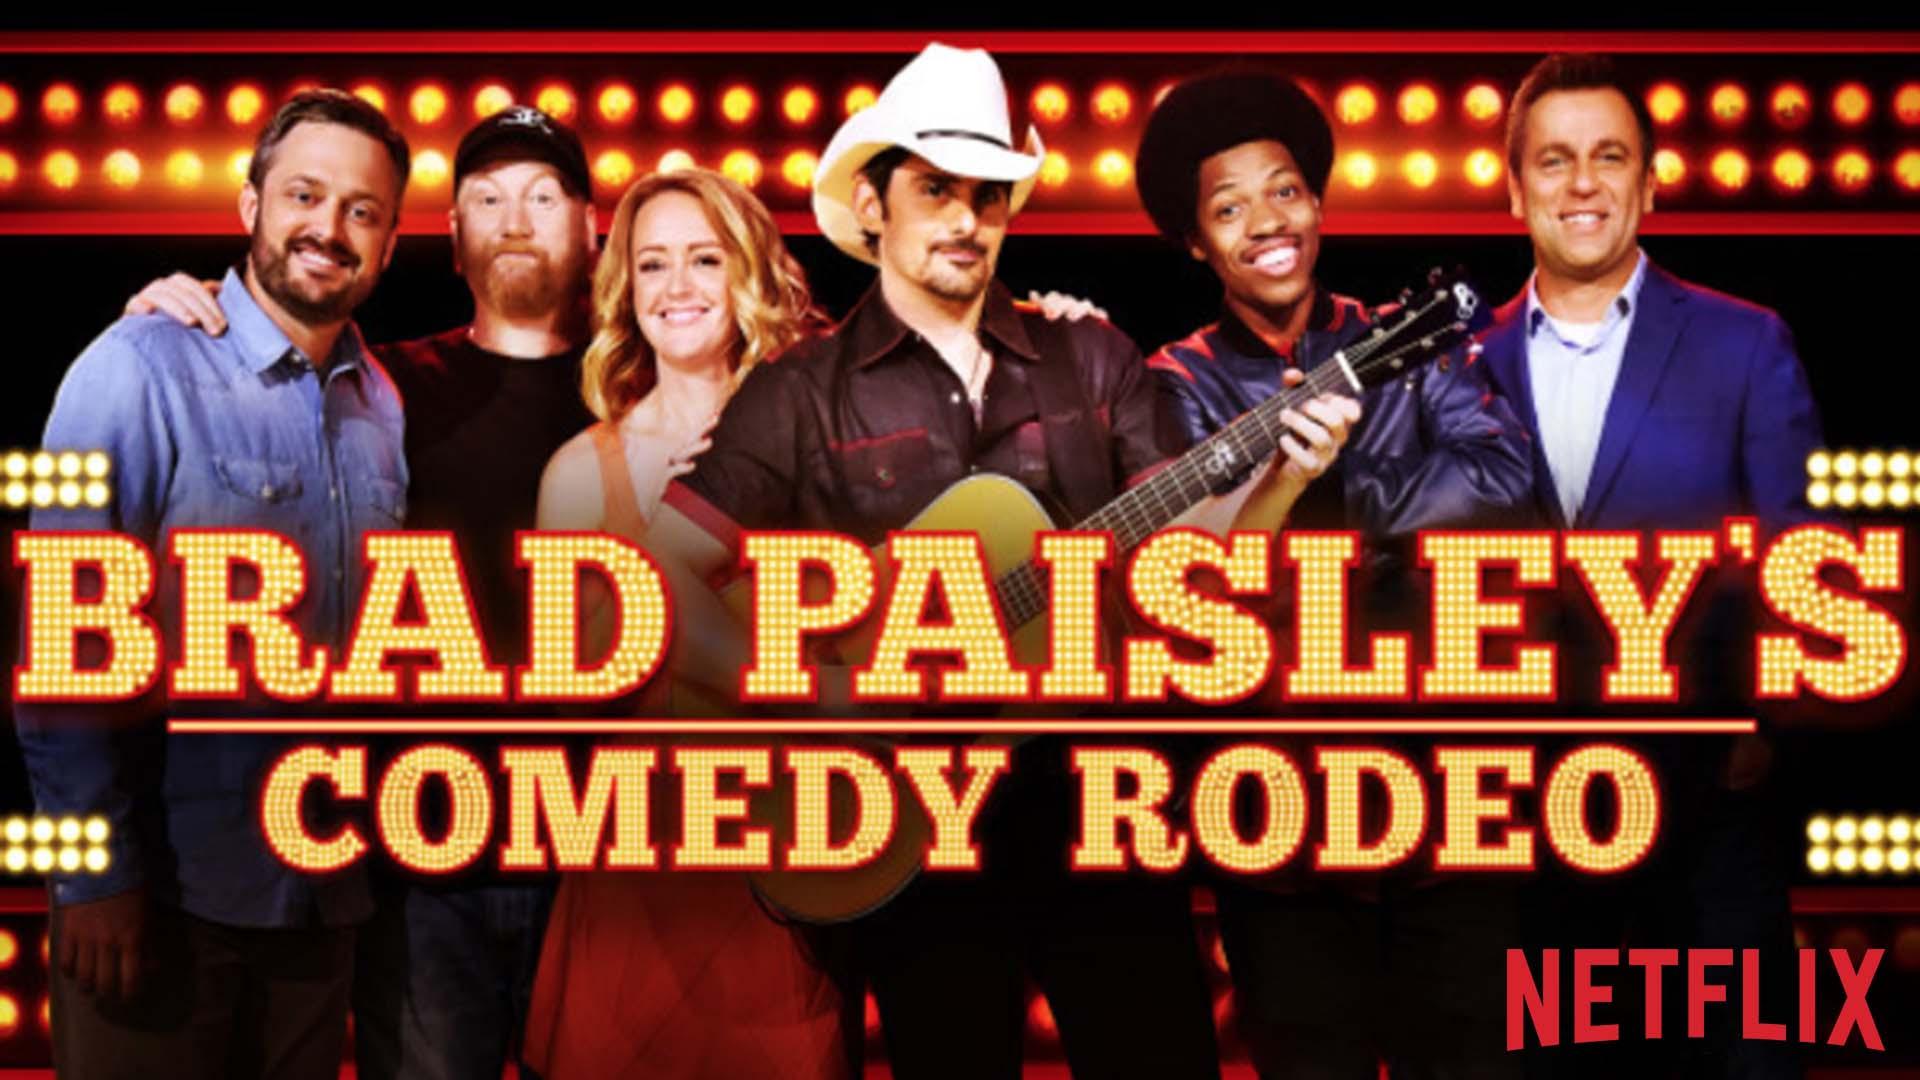 Brad Paisley Comedy Rodeo H